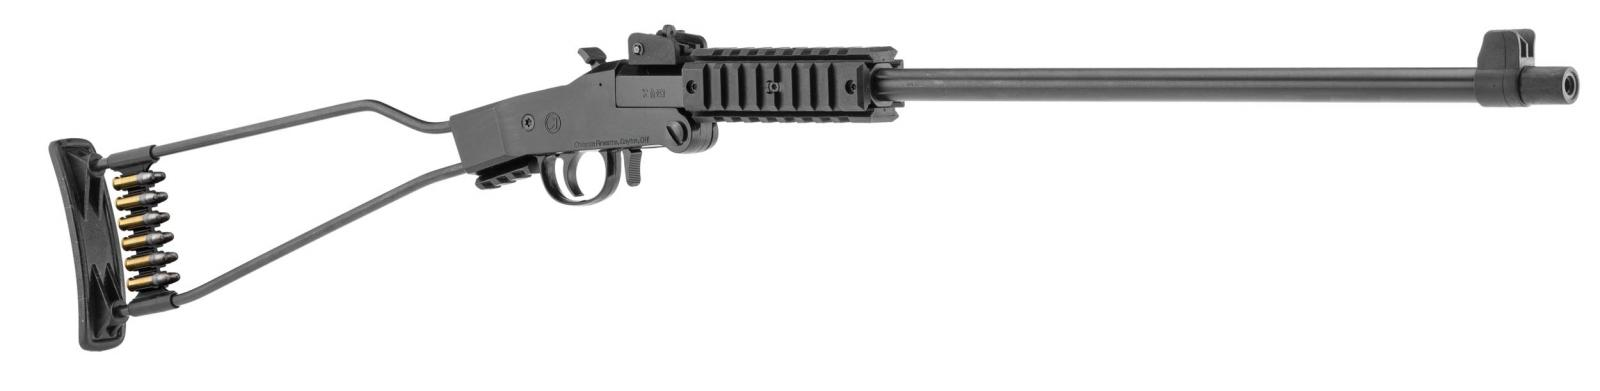 Carabine pliante CHIAPPA Little Badger cal 17 HMR